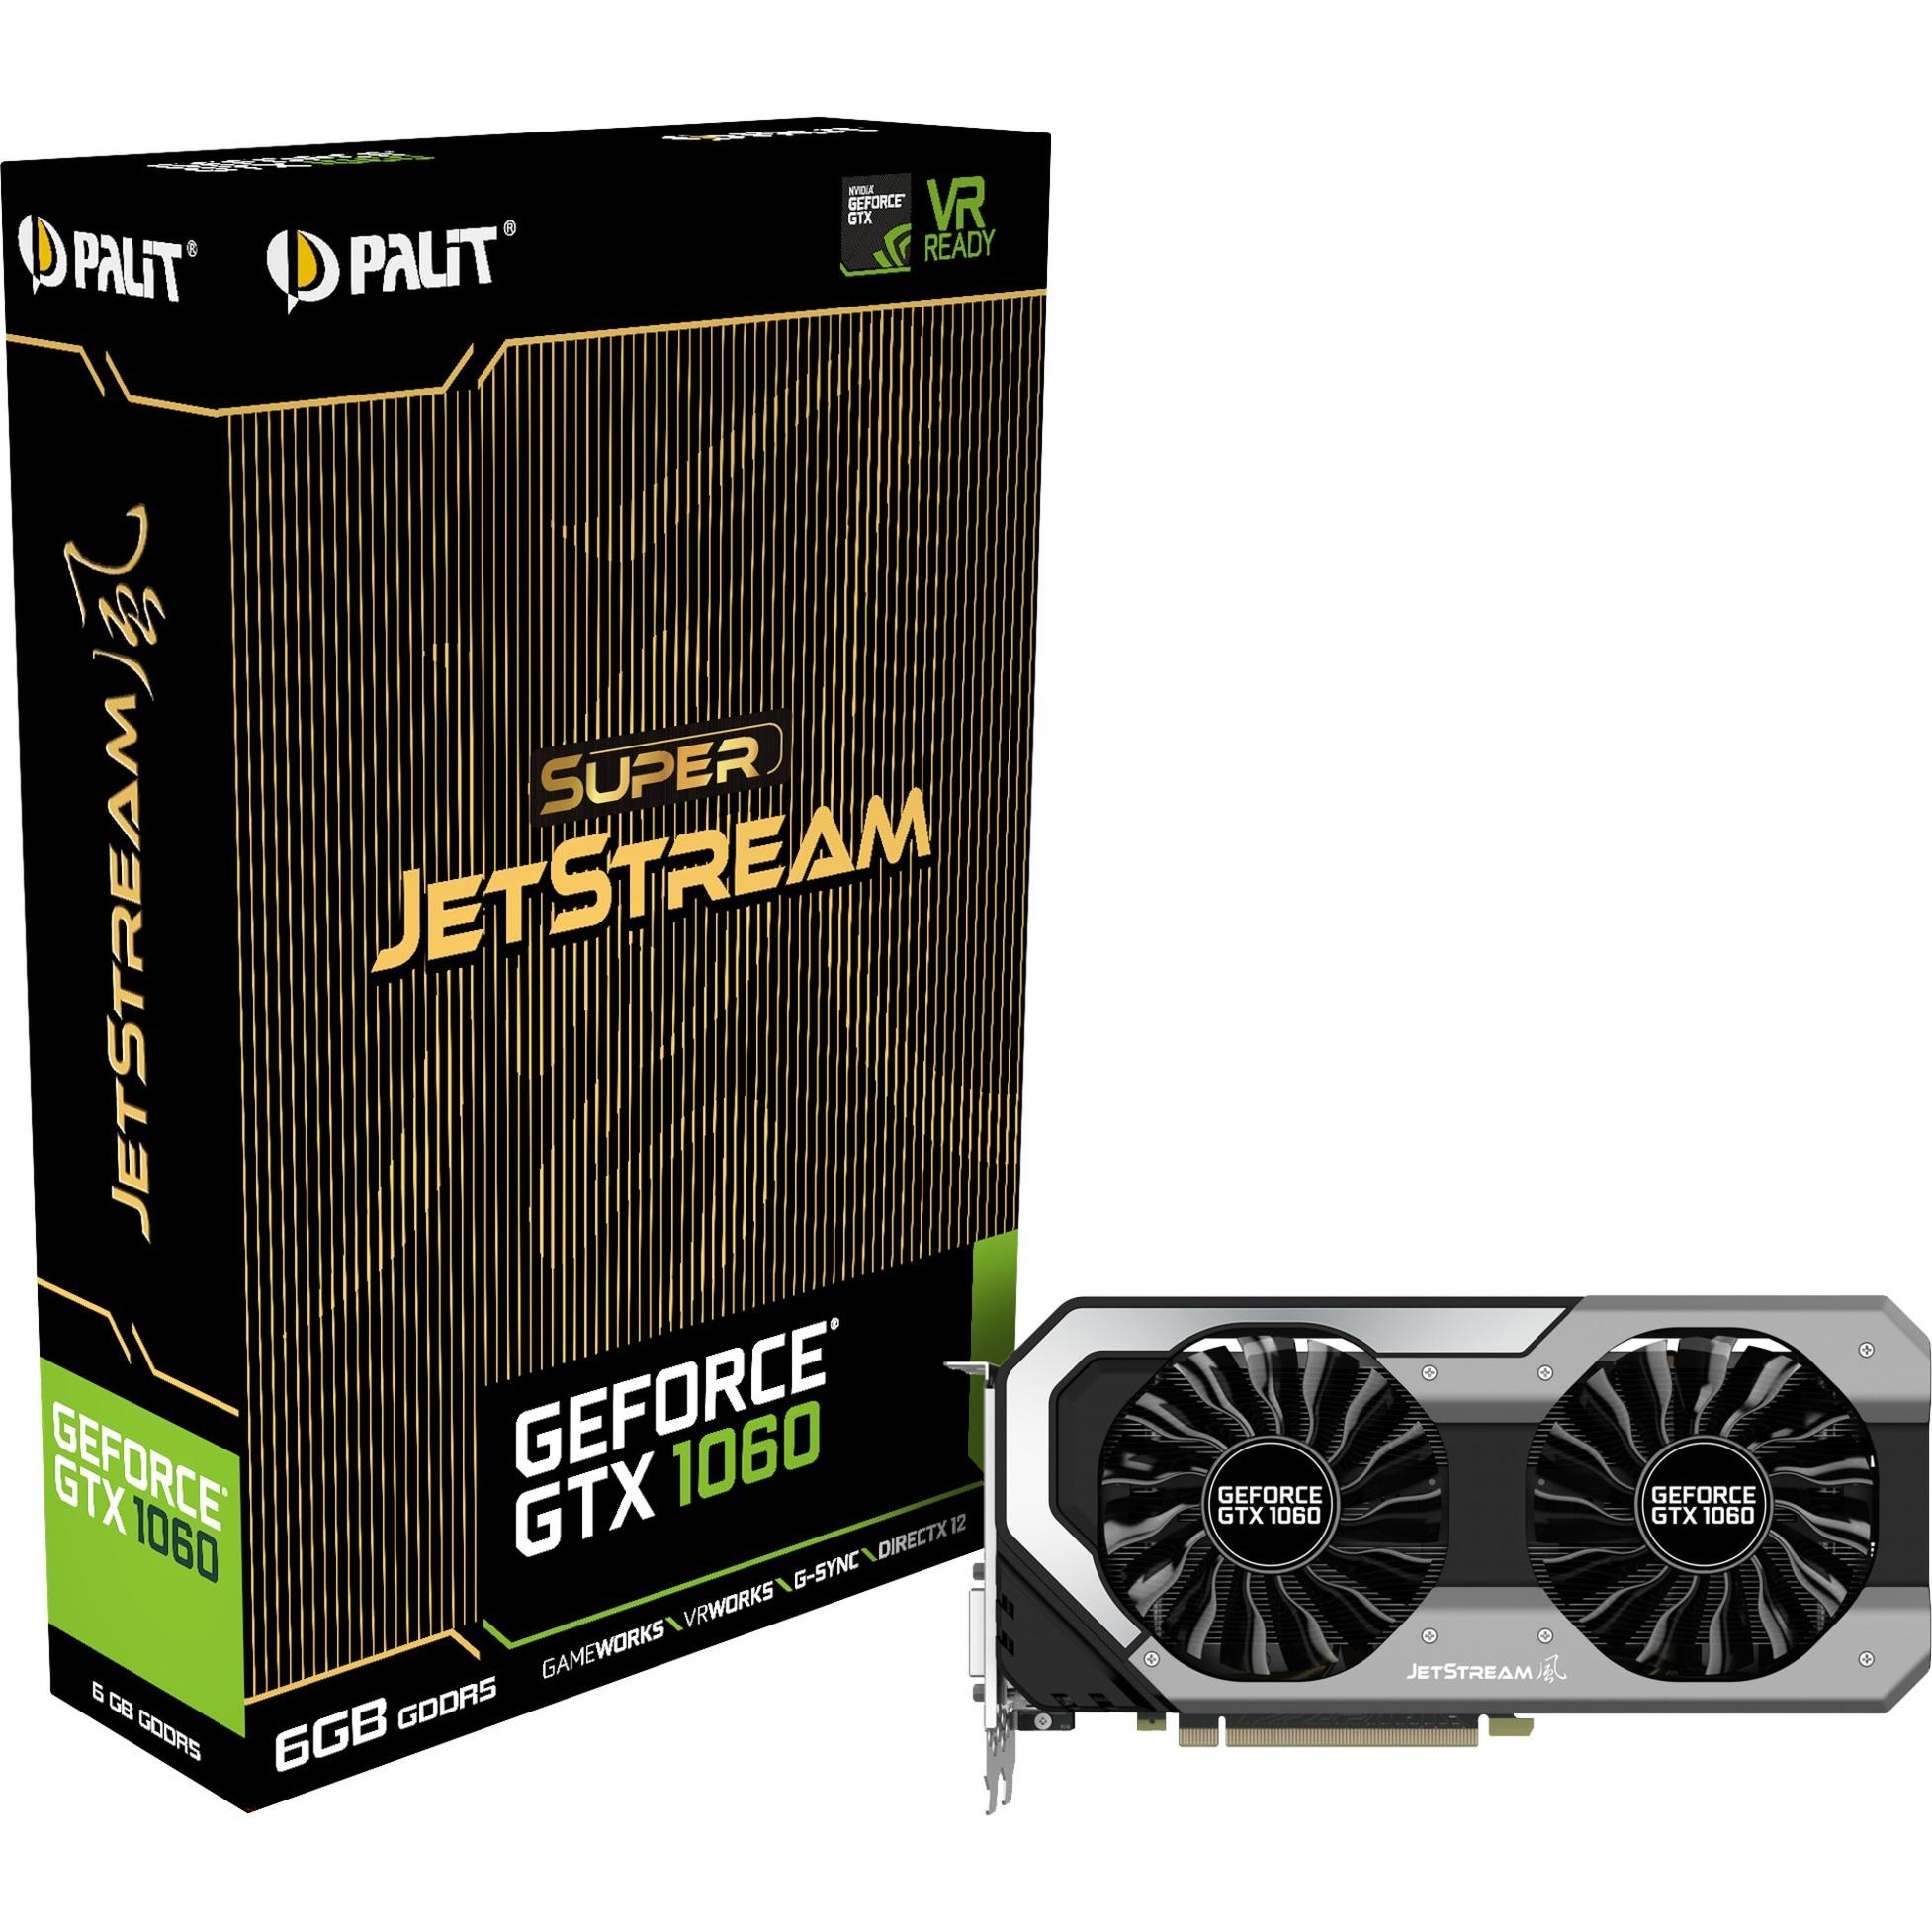 GeForce GTX 1060 Super JetStream GeForce GTX 1060 6GB GDDR5, Tarjeta gráfica